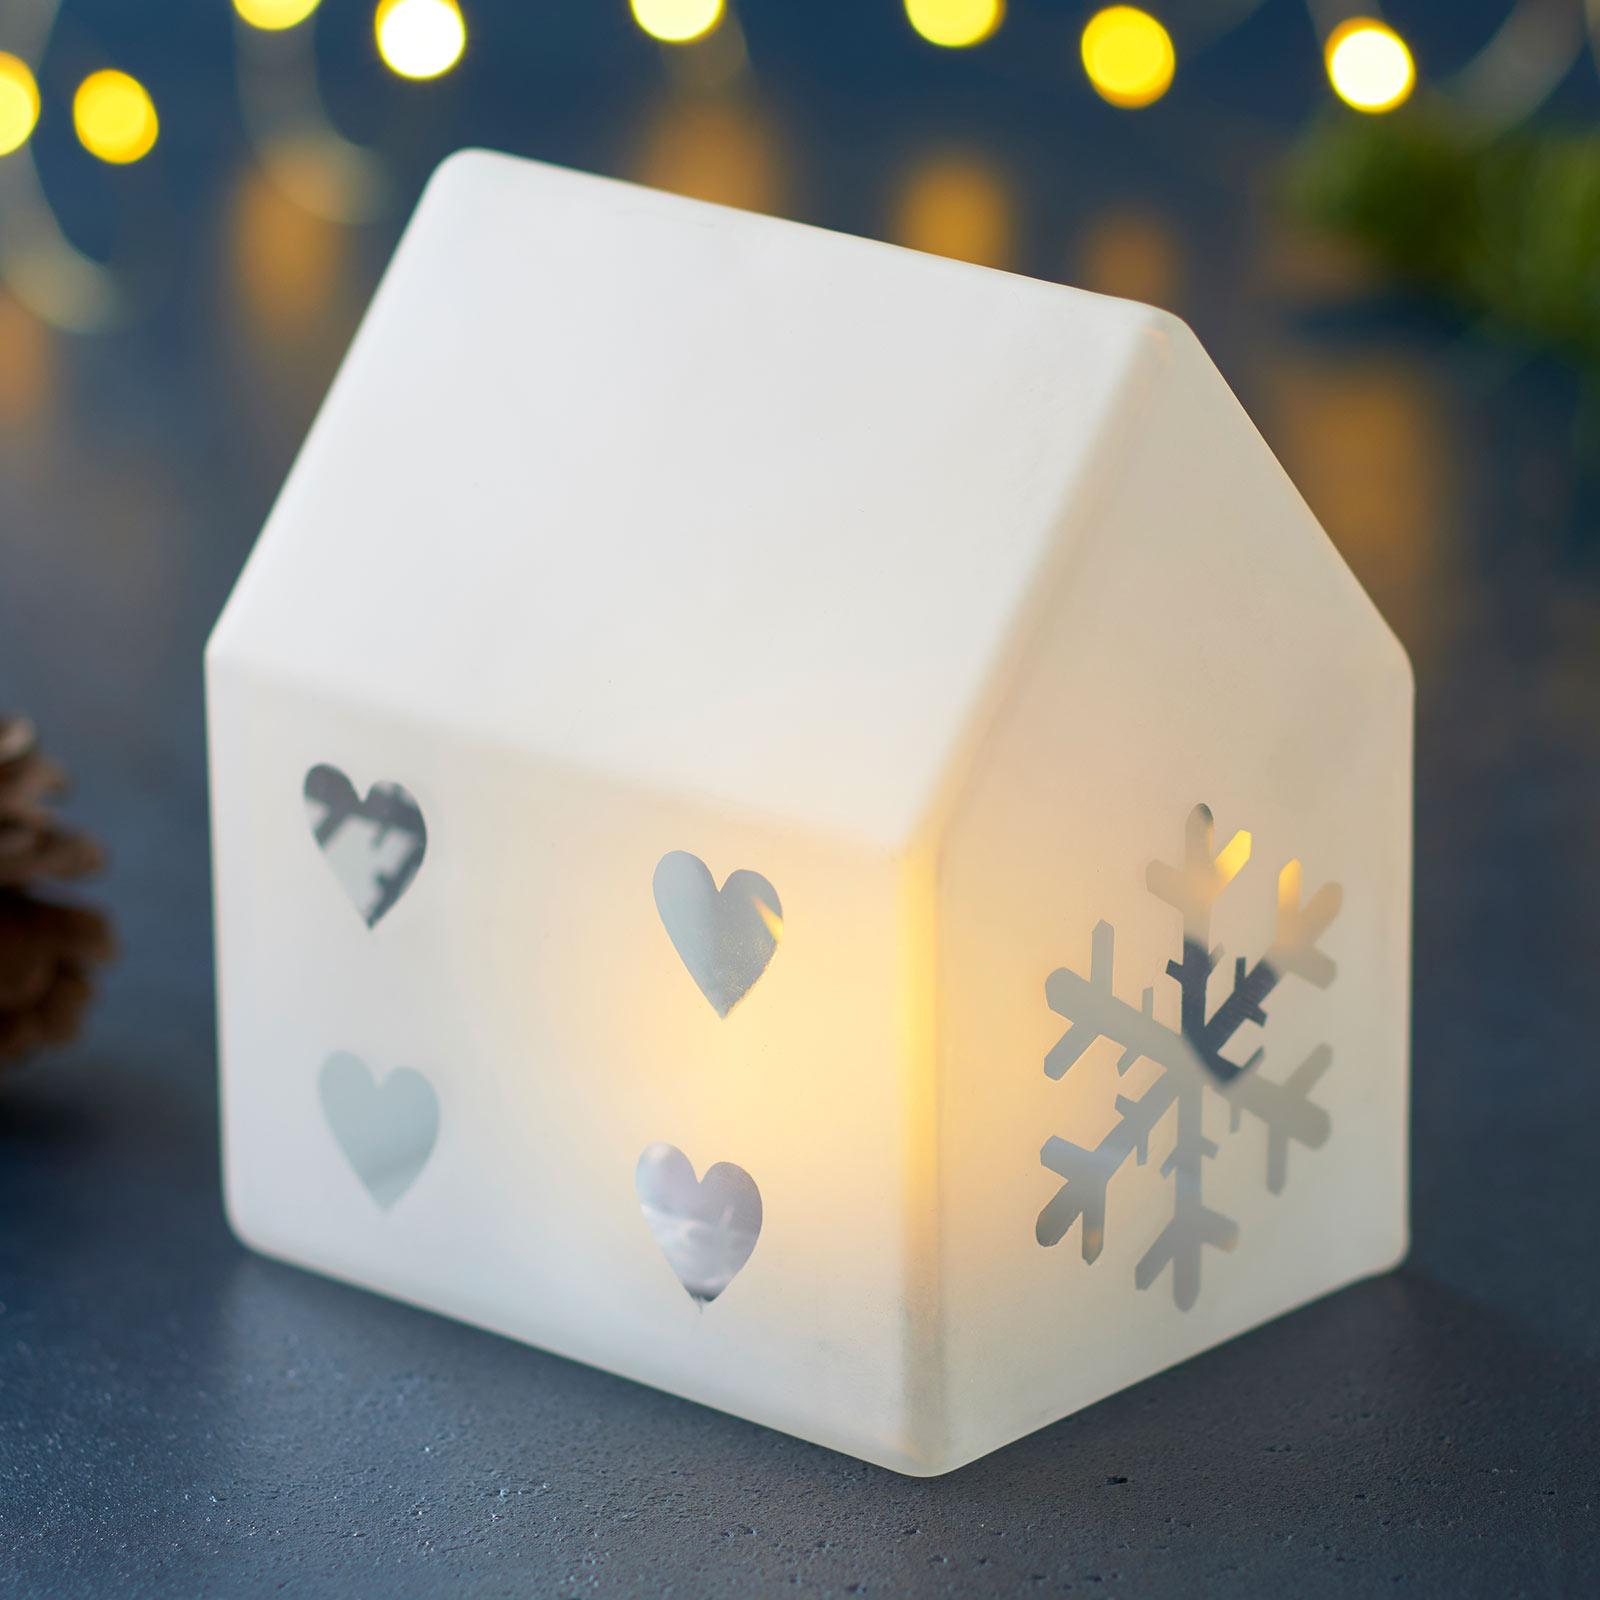 Lámpara decorativa LED Santa House, altura 11,5 cm